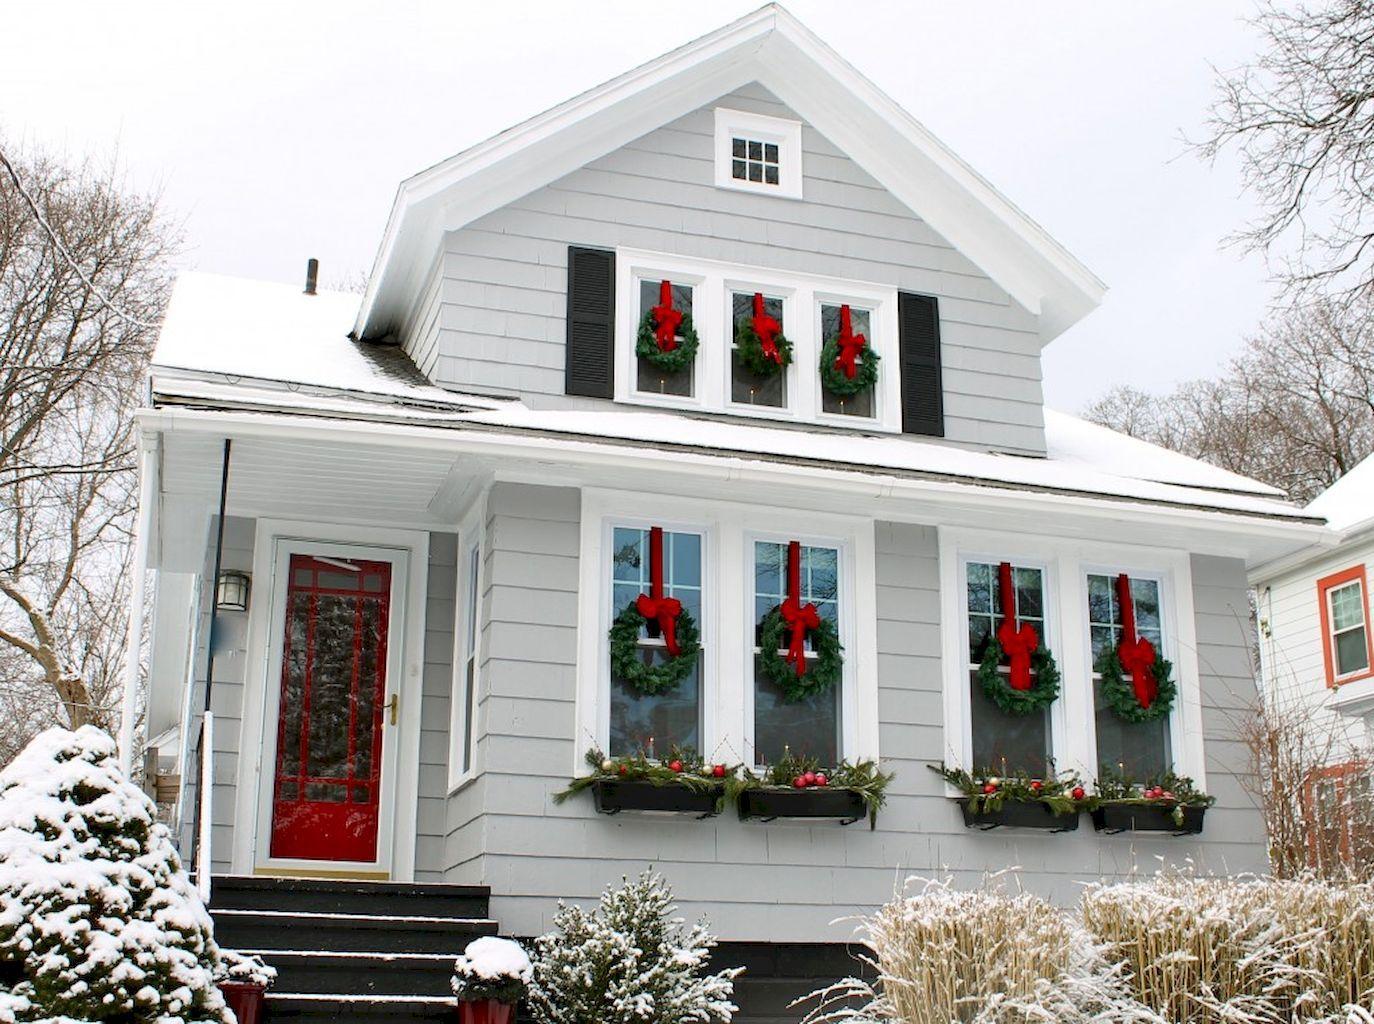 50 Amazing Outdoor Christmas Decoration Ideas | Outdoor christmas ...